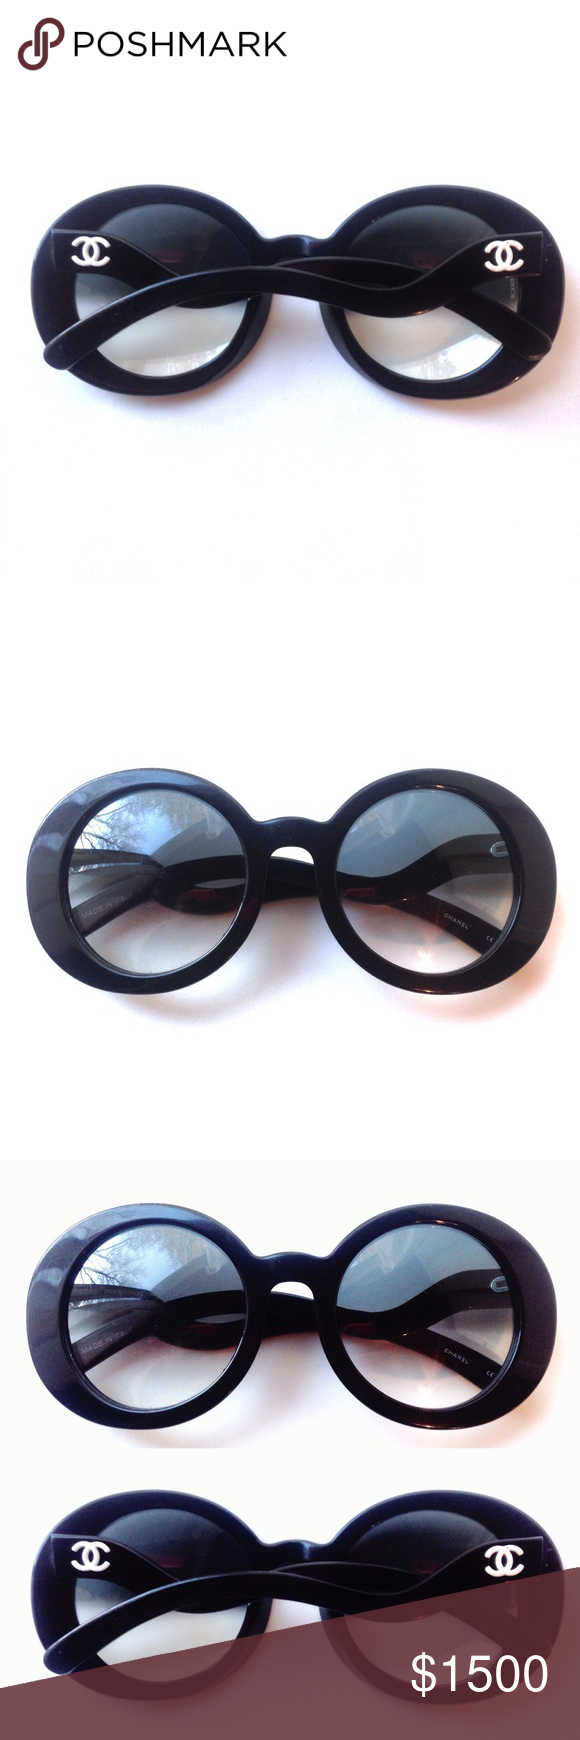 2c3c6f315b39f CHANEL 5018 Half Tint Wavy Arm Sunglasses RARE Very rare authentic CHANEL.  1 of 500